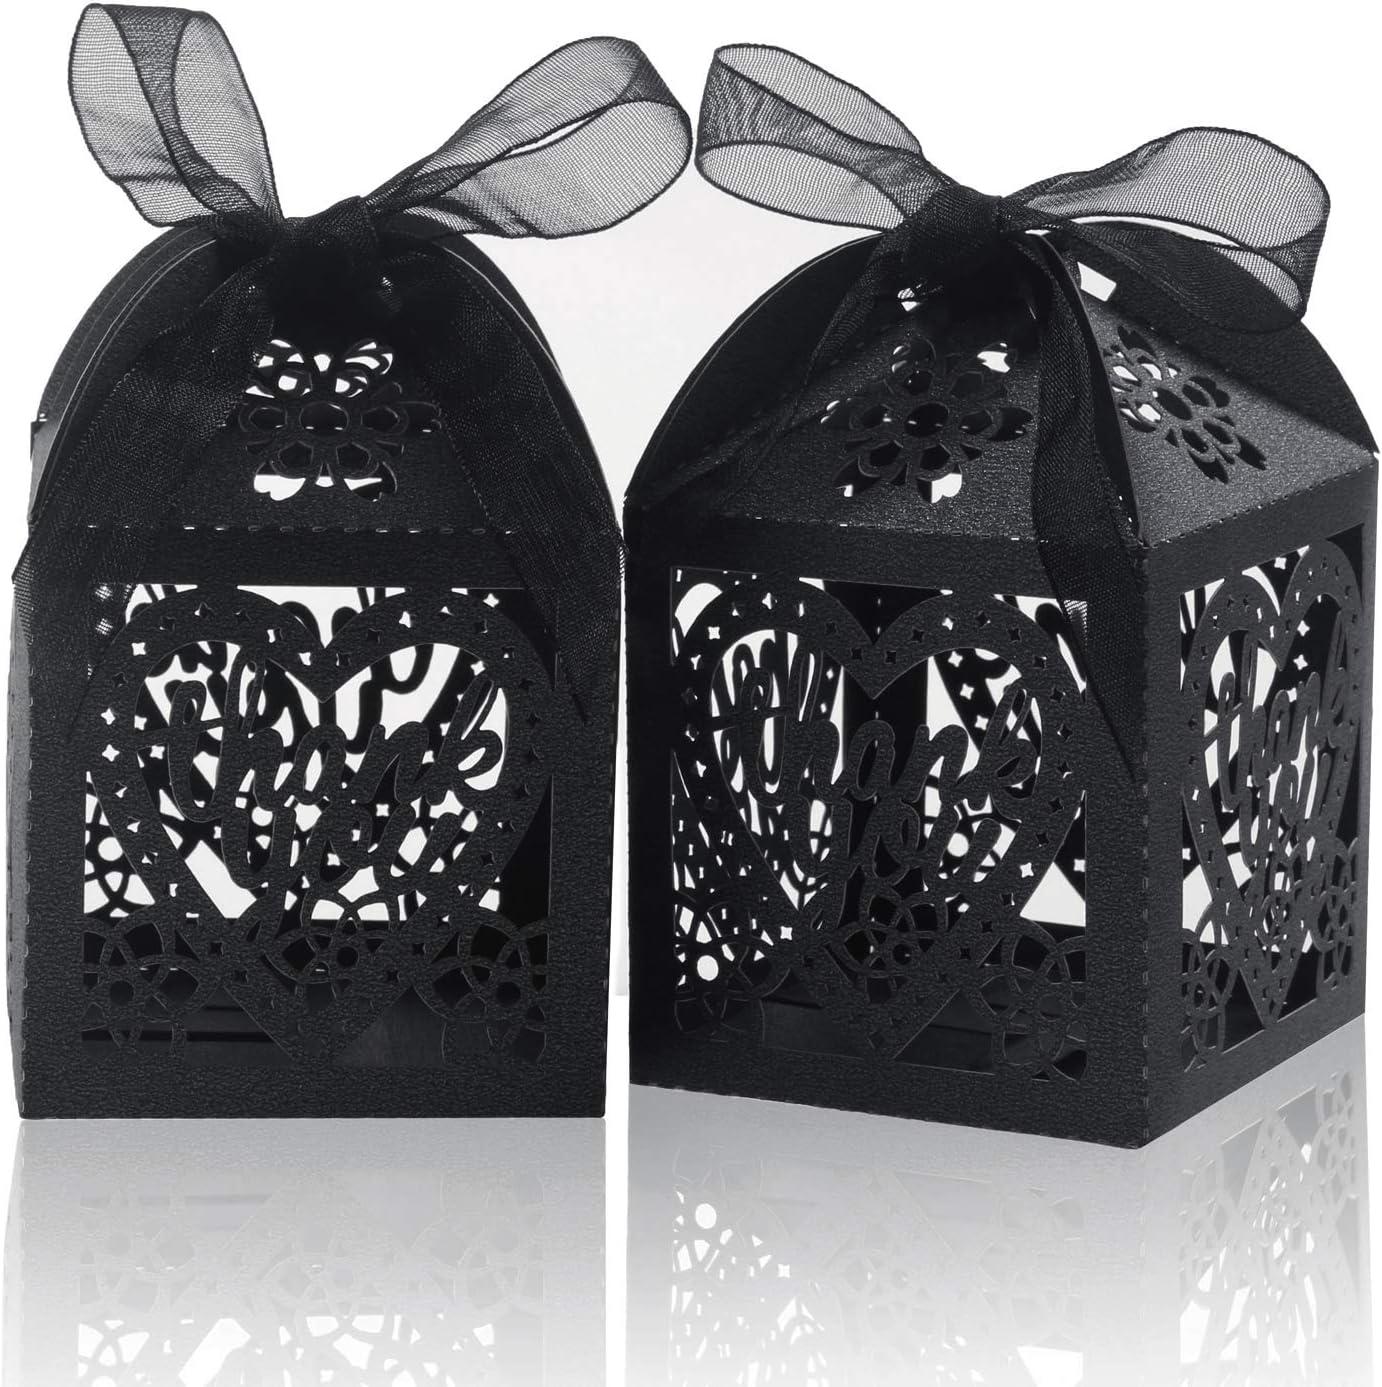 20 Acrylic Boxes Wedding favor box birthday party boxes bridal shower box